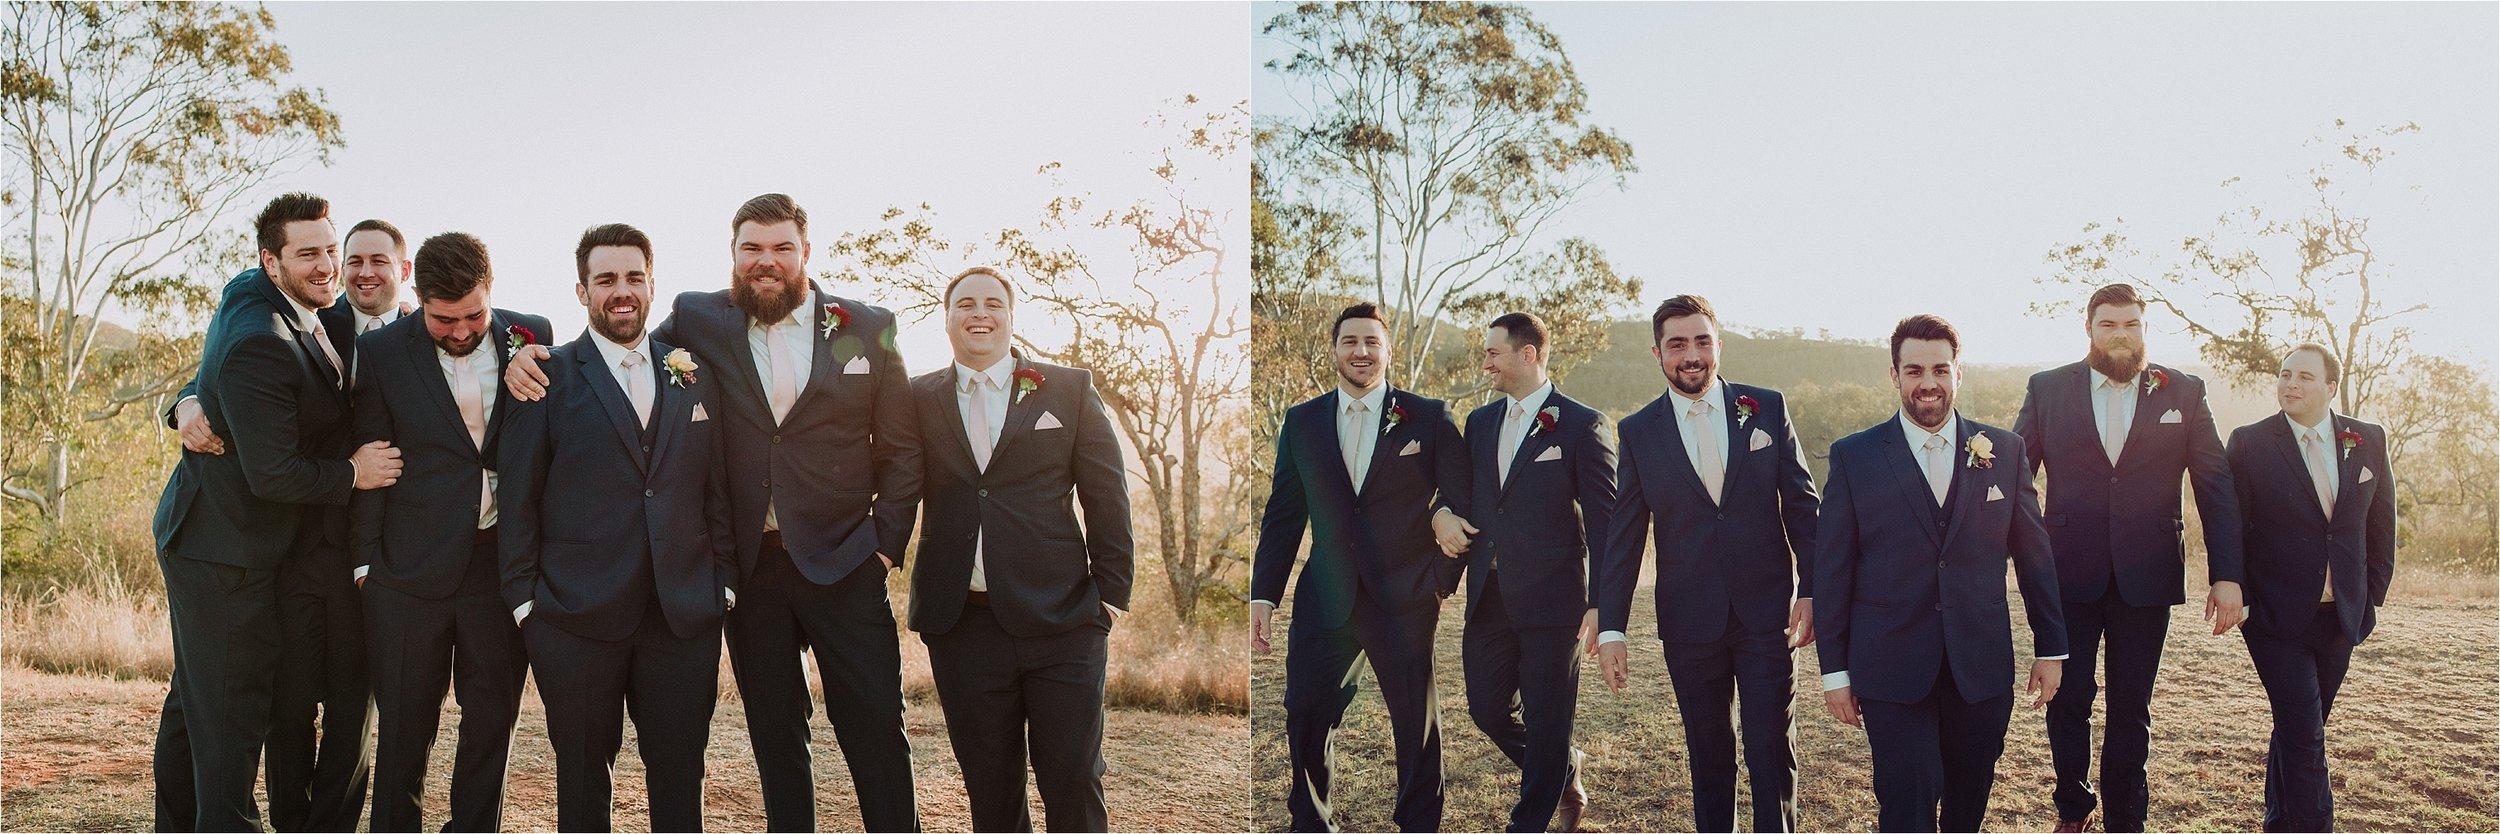 Towoomba - Preston - Peak - Wedding - Gold - Coast - Wedding - Photographers_0053.jpg